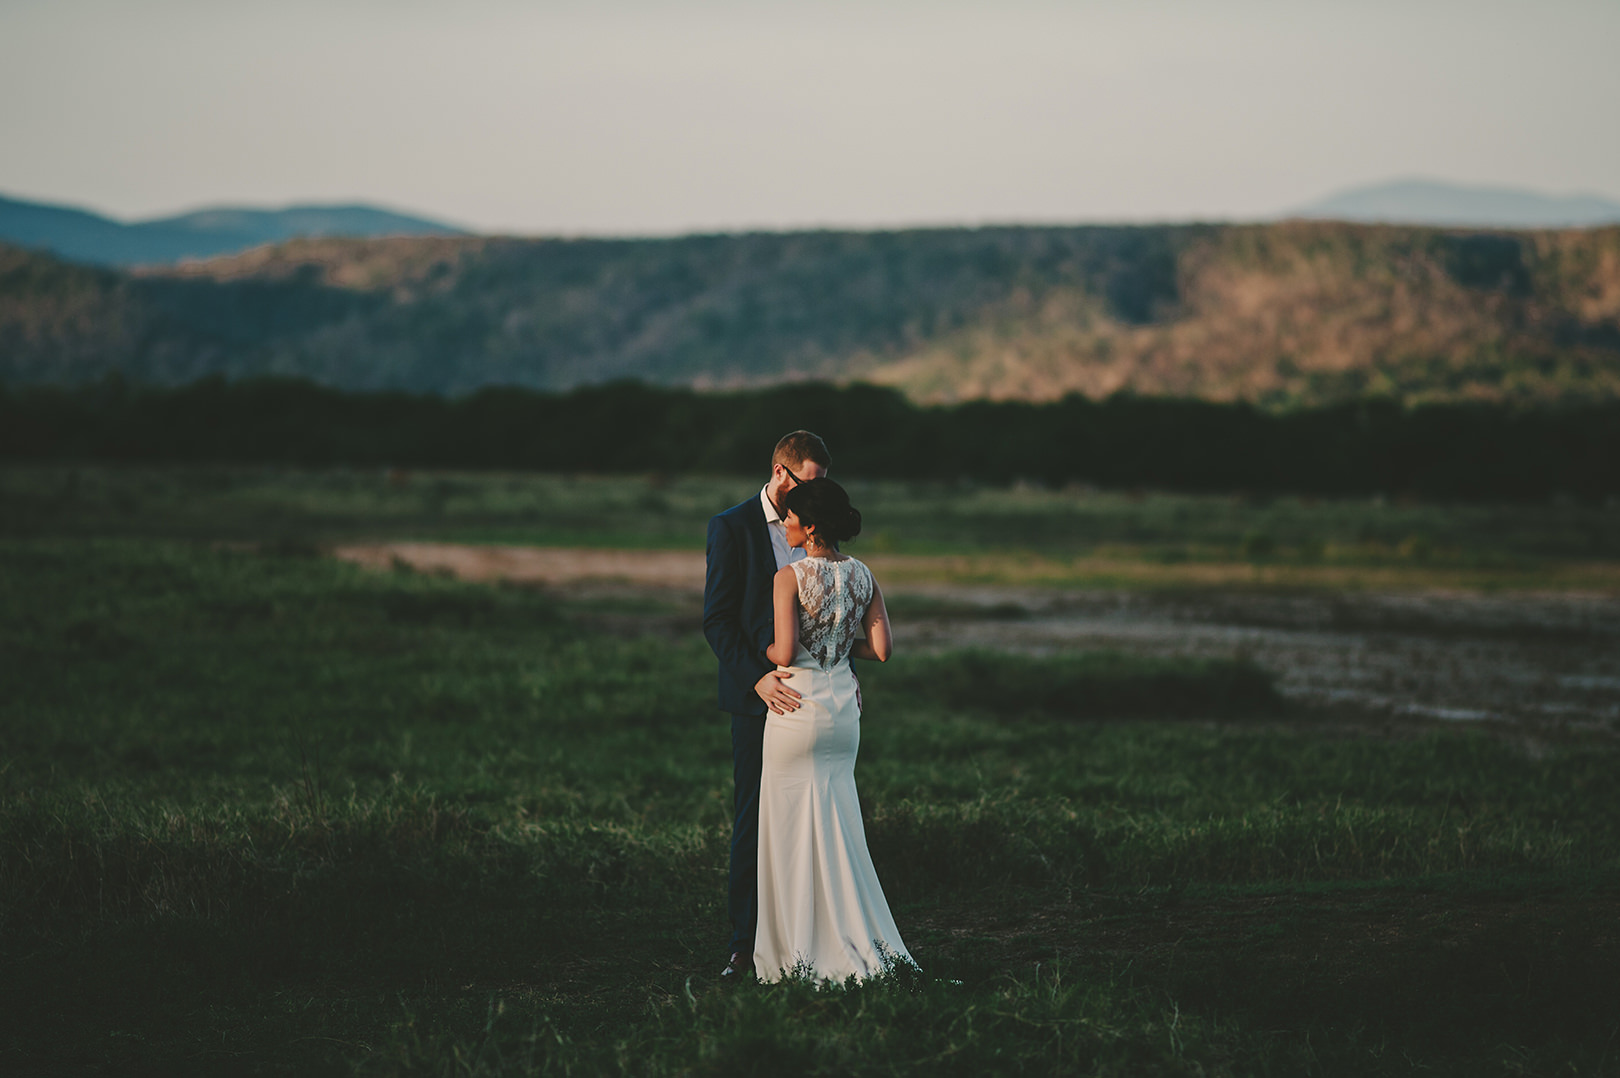 Nathan & Felicia - Wedding Day - © Dallas Kolotylo Photography - 552